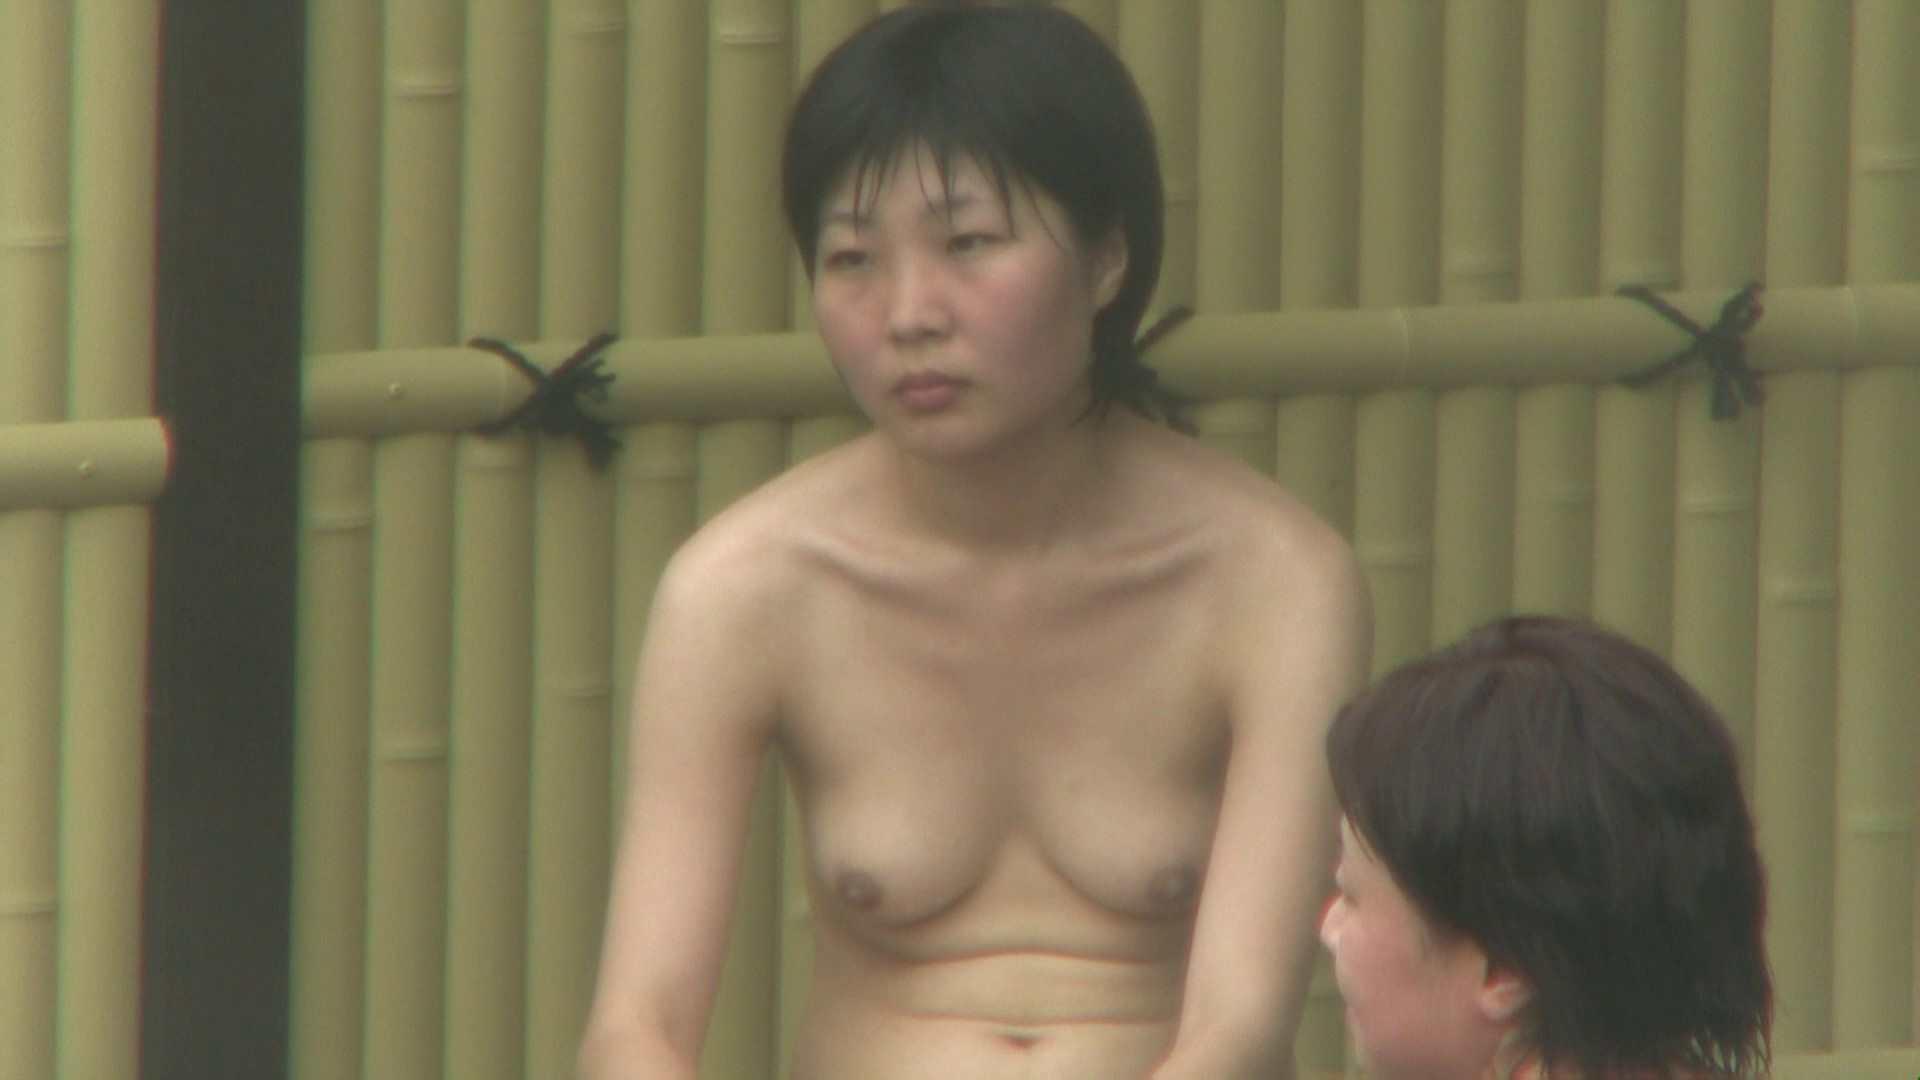 Aquaな露天風呂Vol.74【VIP限定】 盗撮 隠し撮りオマンコ動画紹介 68画像 26